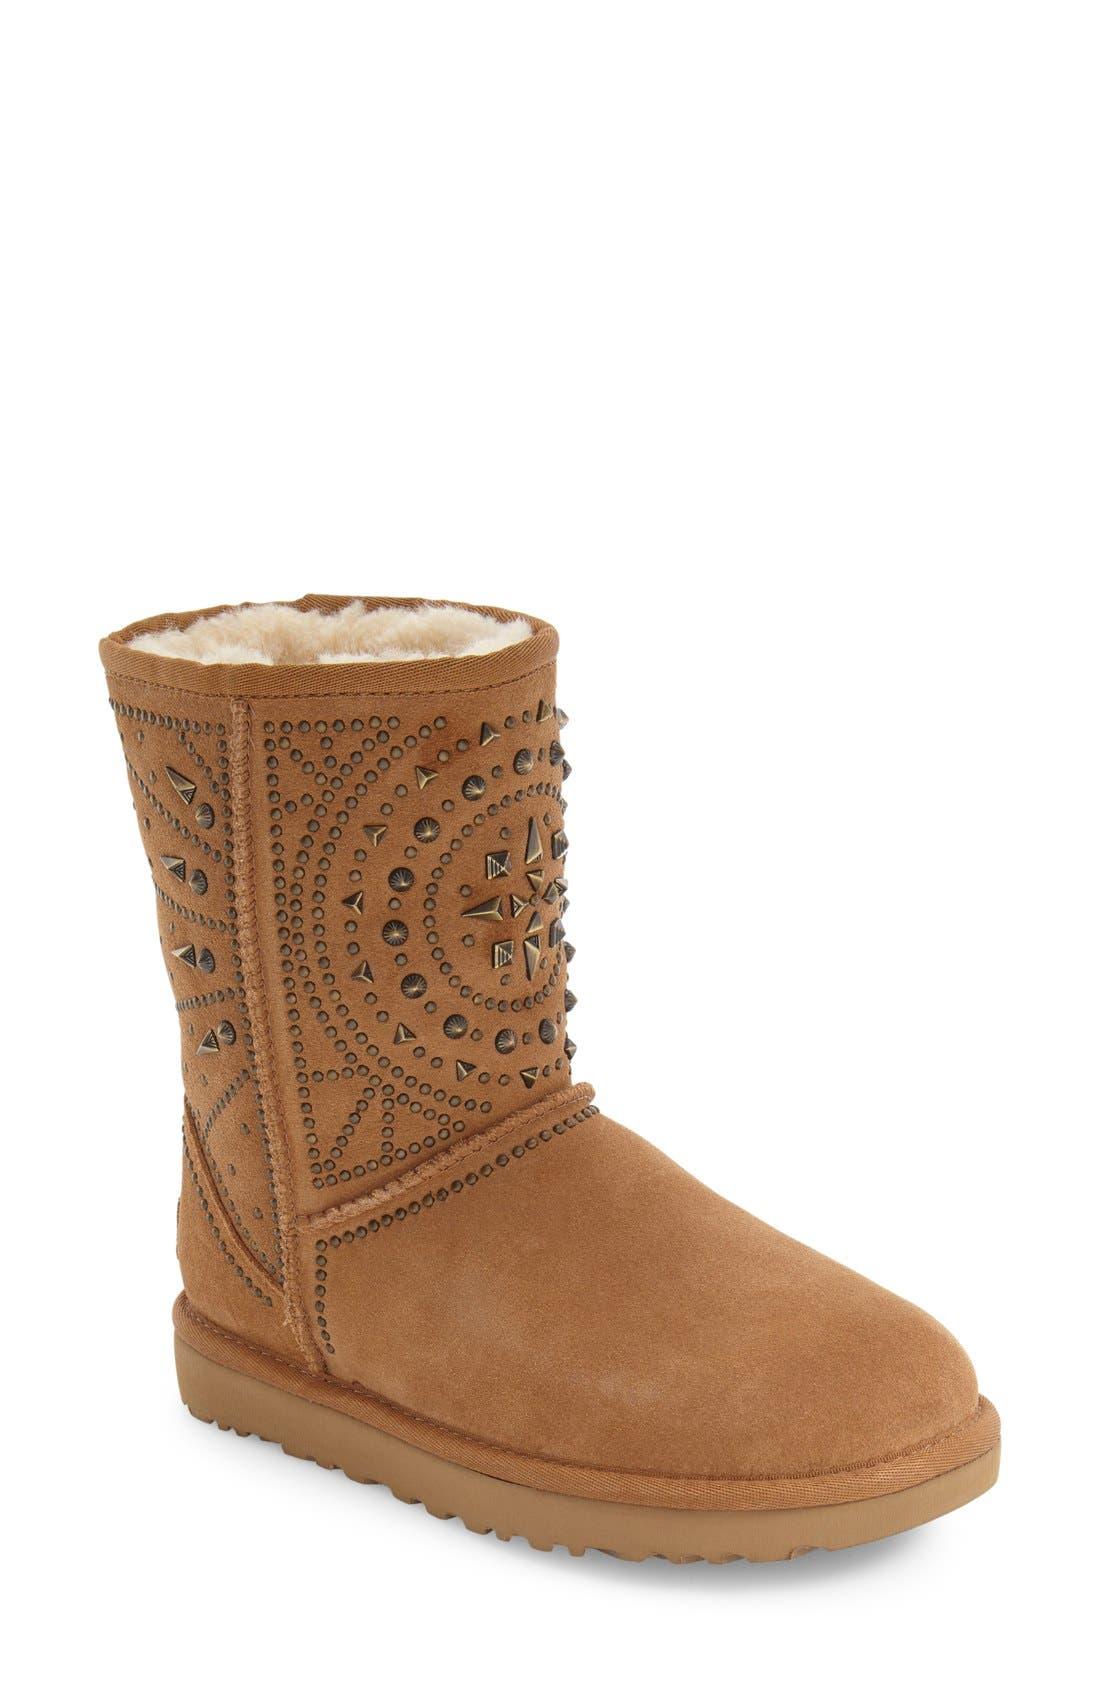 Main Image - UGG® Fiore Deco Studs Boot (Women)